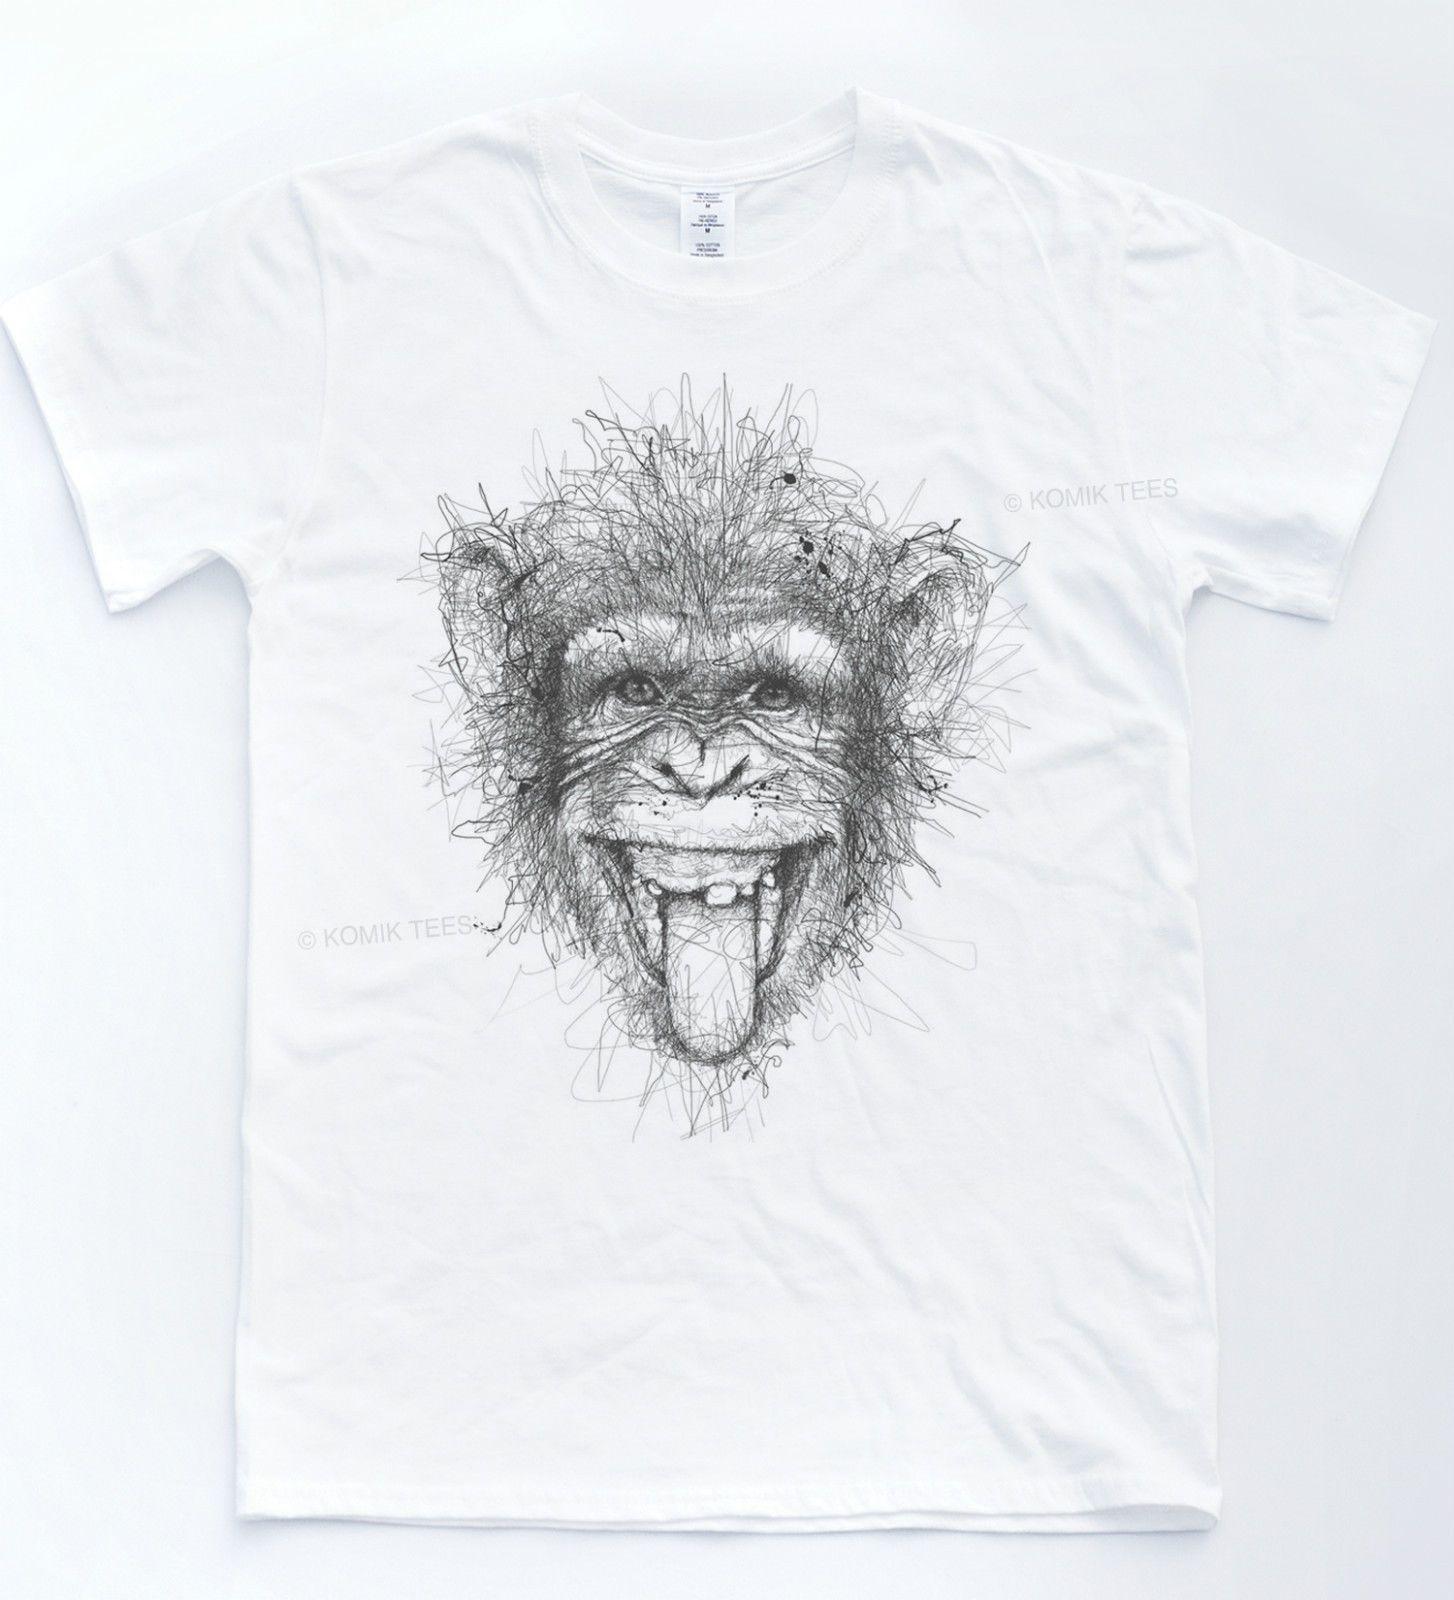 Monkey sketch t shirt drawn art indie tee animal chimp funny portrait pencil top colour jersey print t shirt jersey print t shirt shirt designs best t